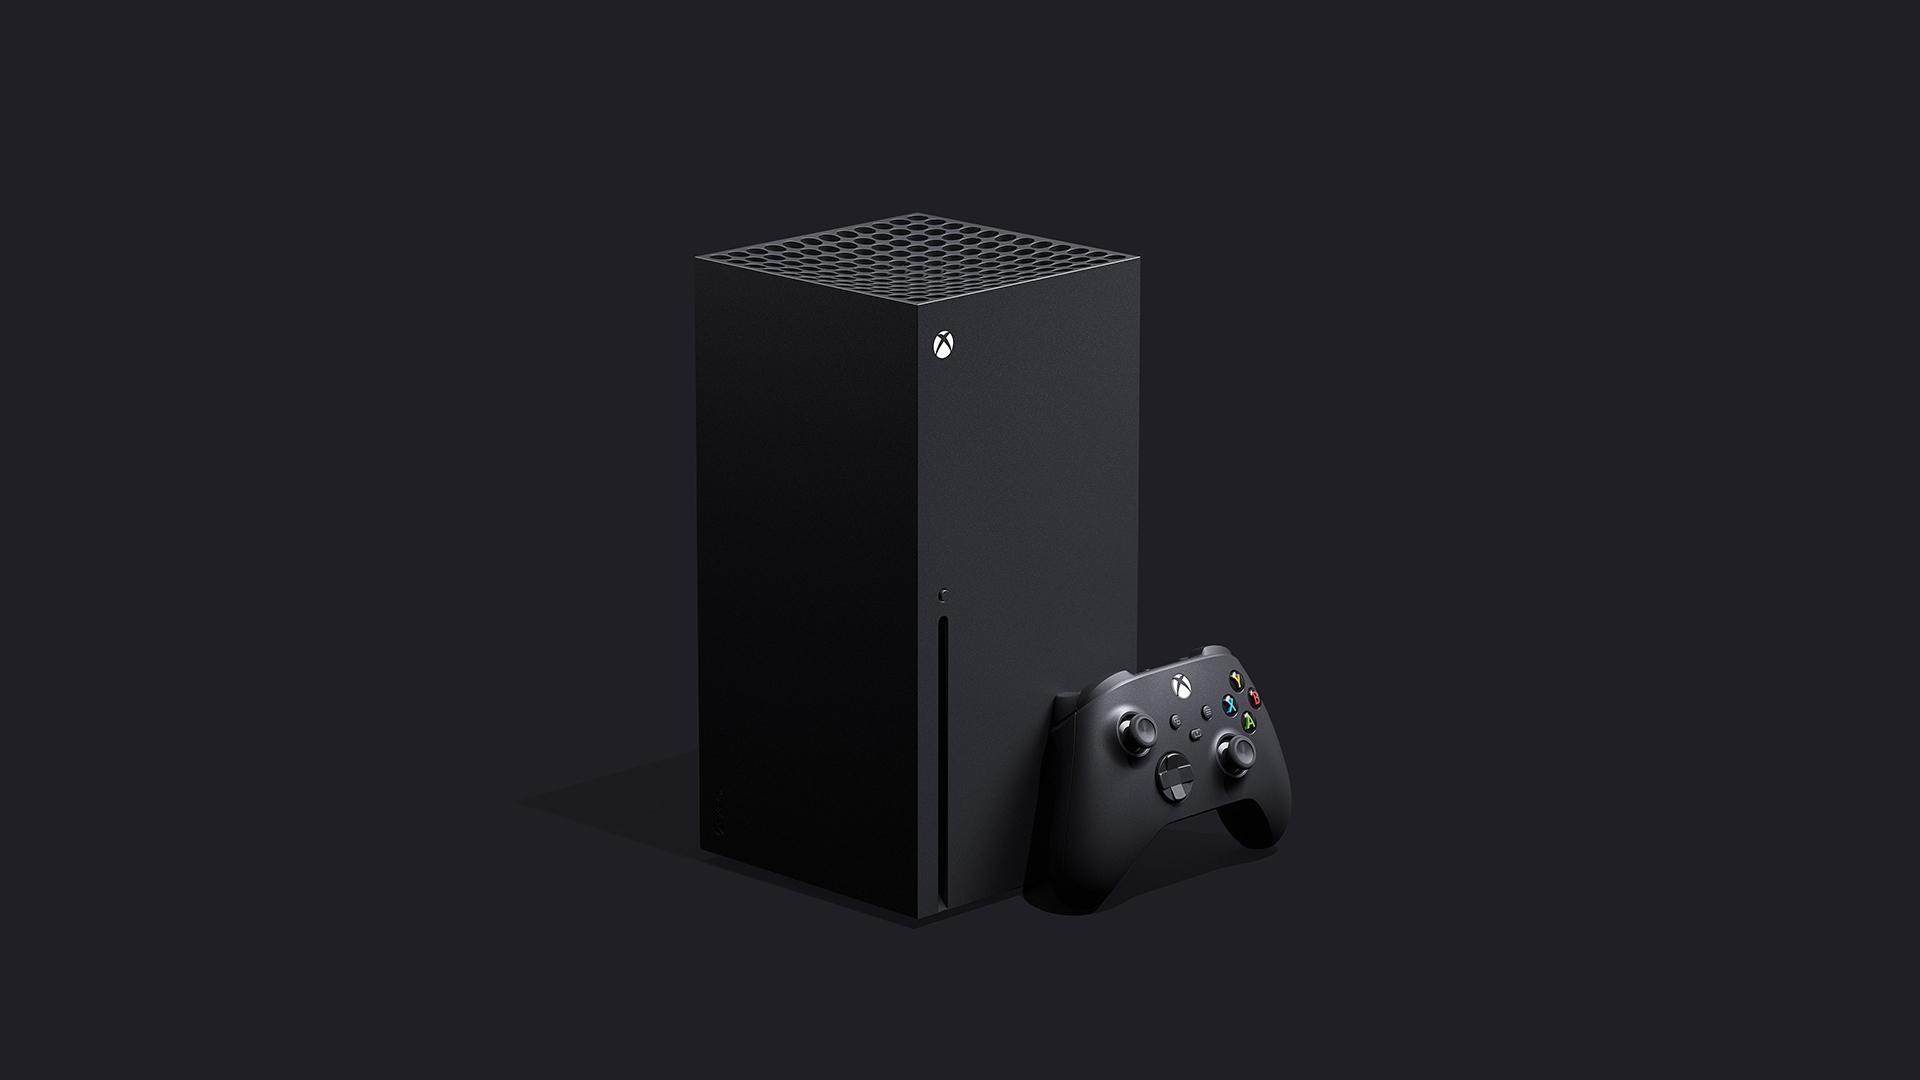 PS5已在法国售出10.7万台 近Xbox Series的三倍